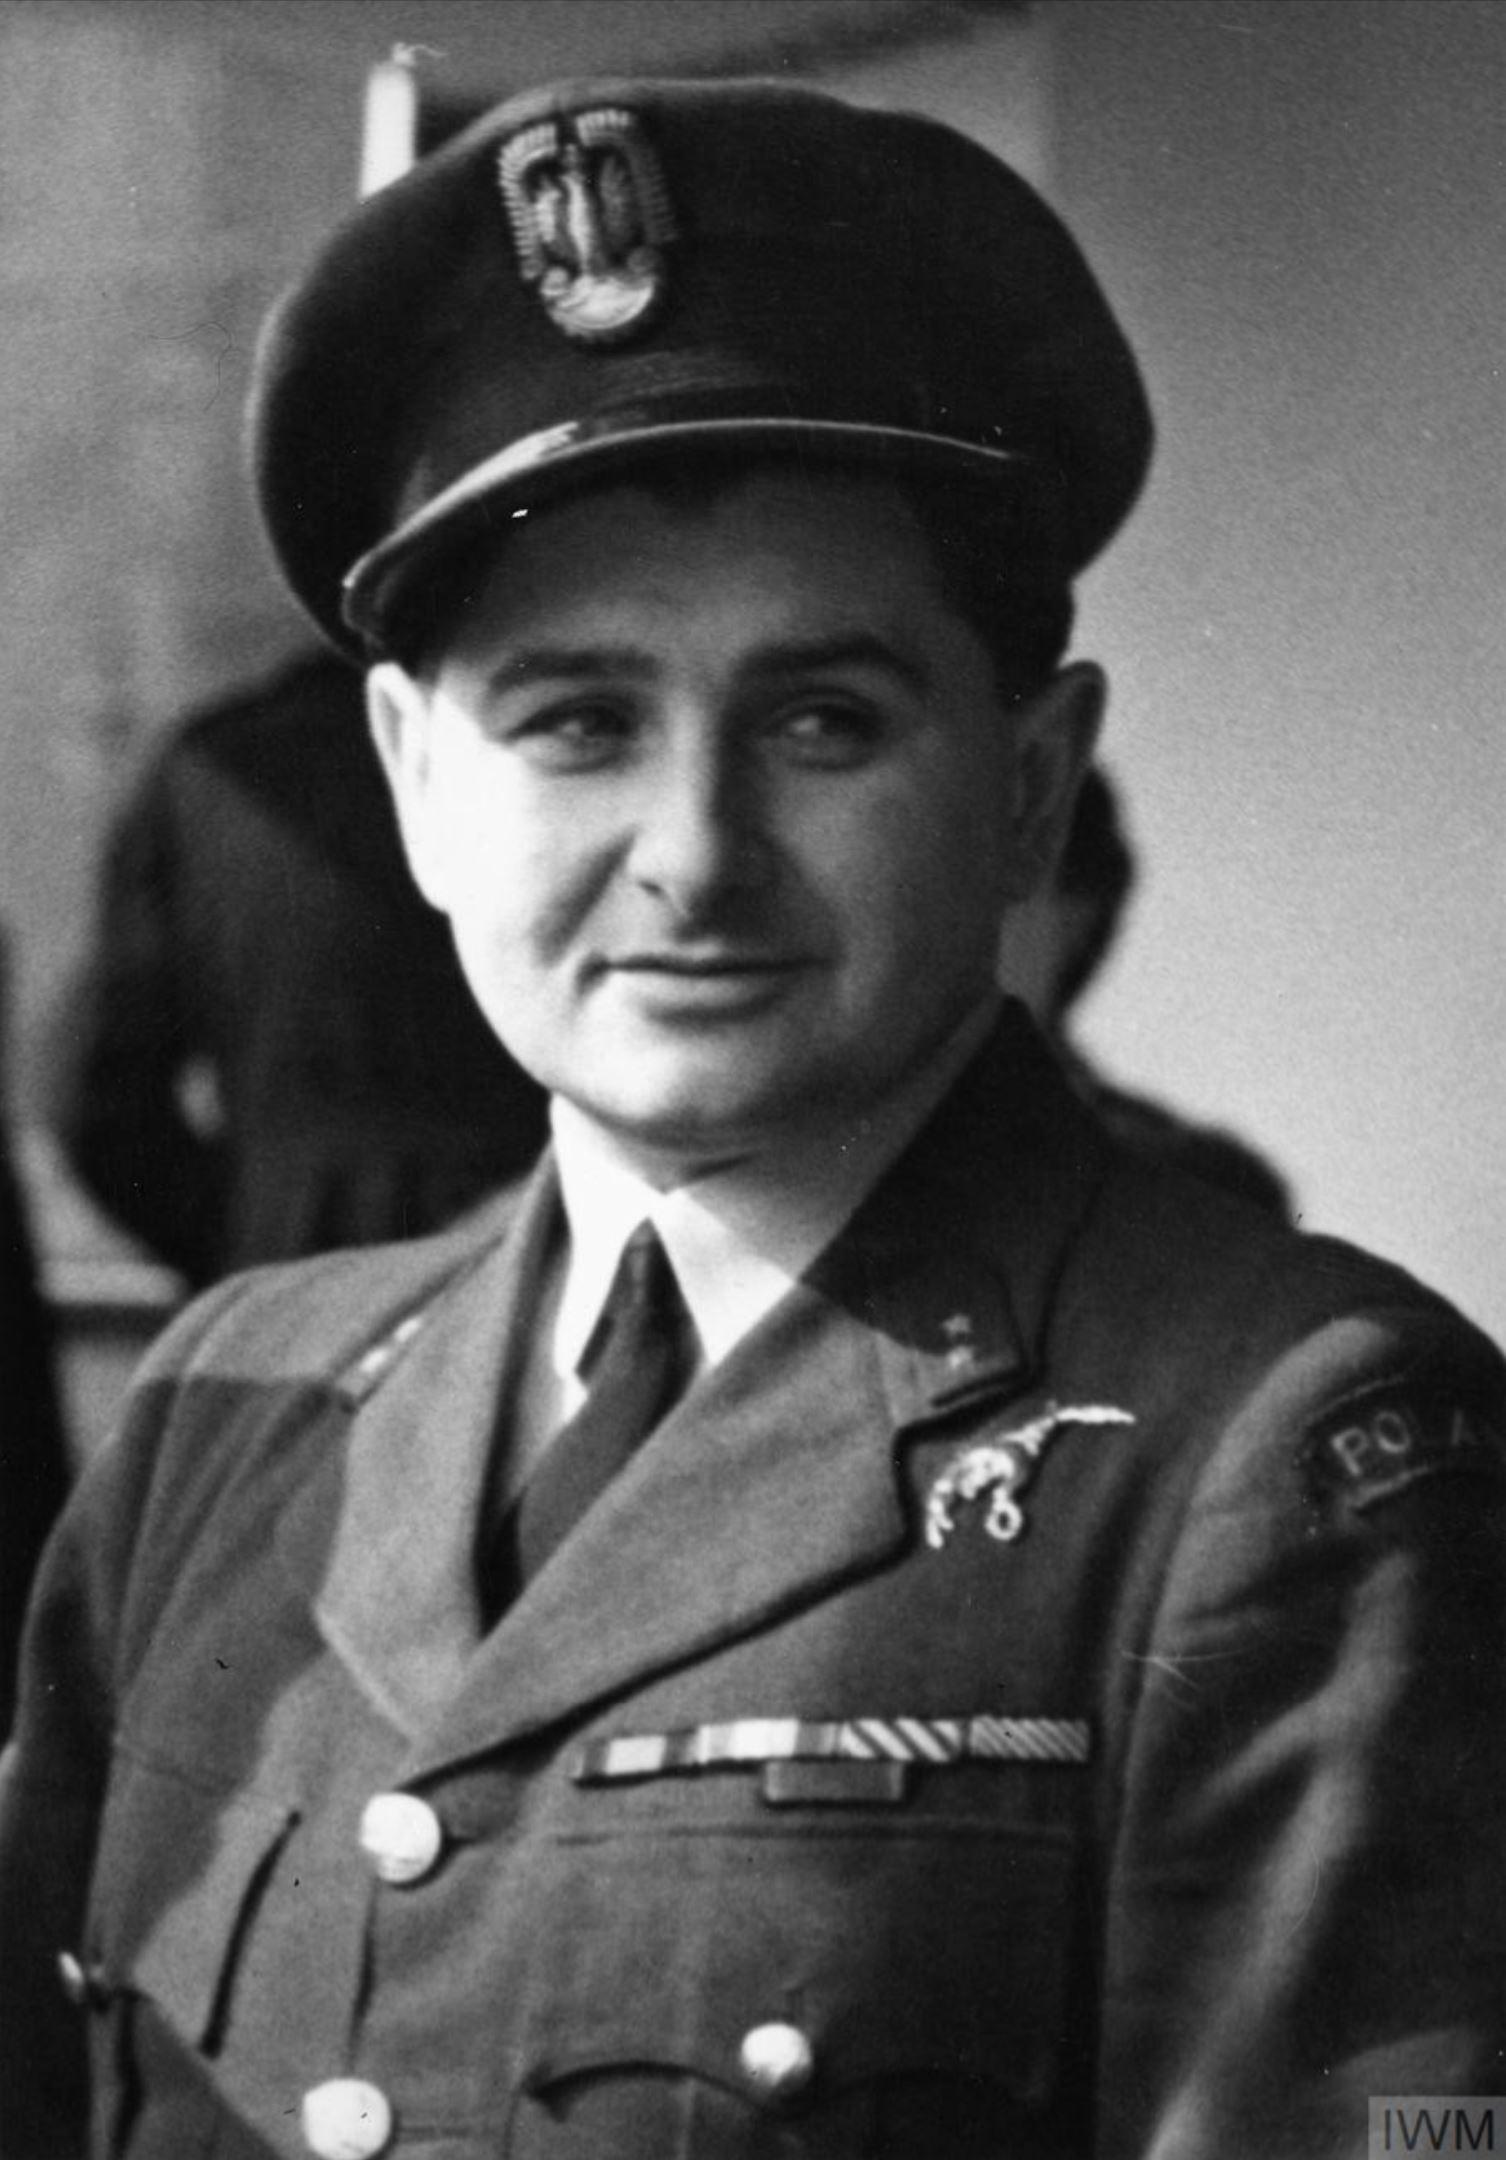 Aircrew RAF 308Sqn (Polish) pilot Antoni Tony Glowacki 13 Apr 1943 IWM HU106461